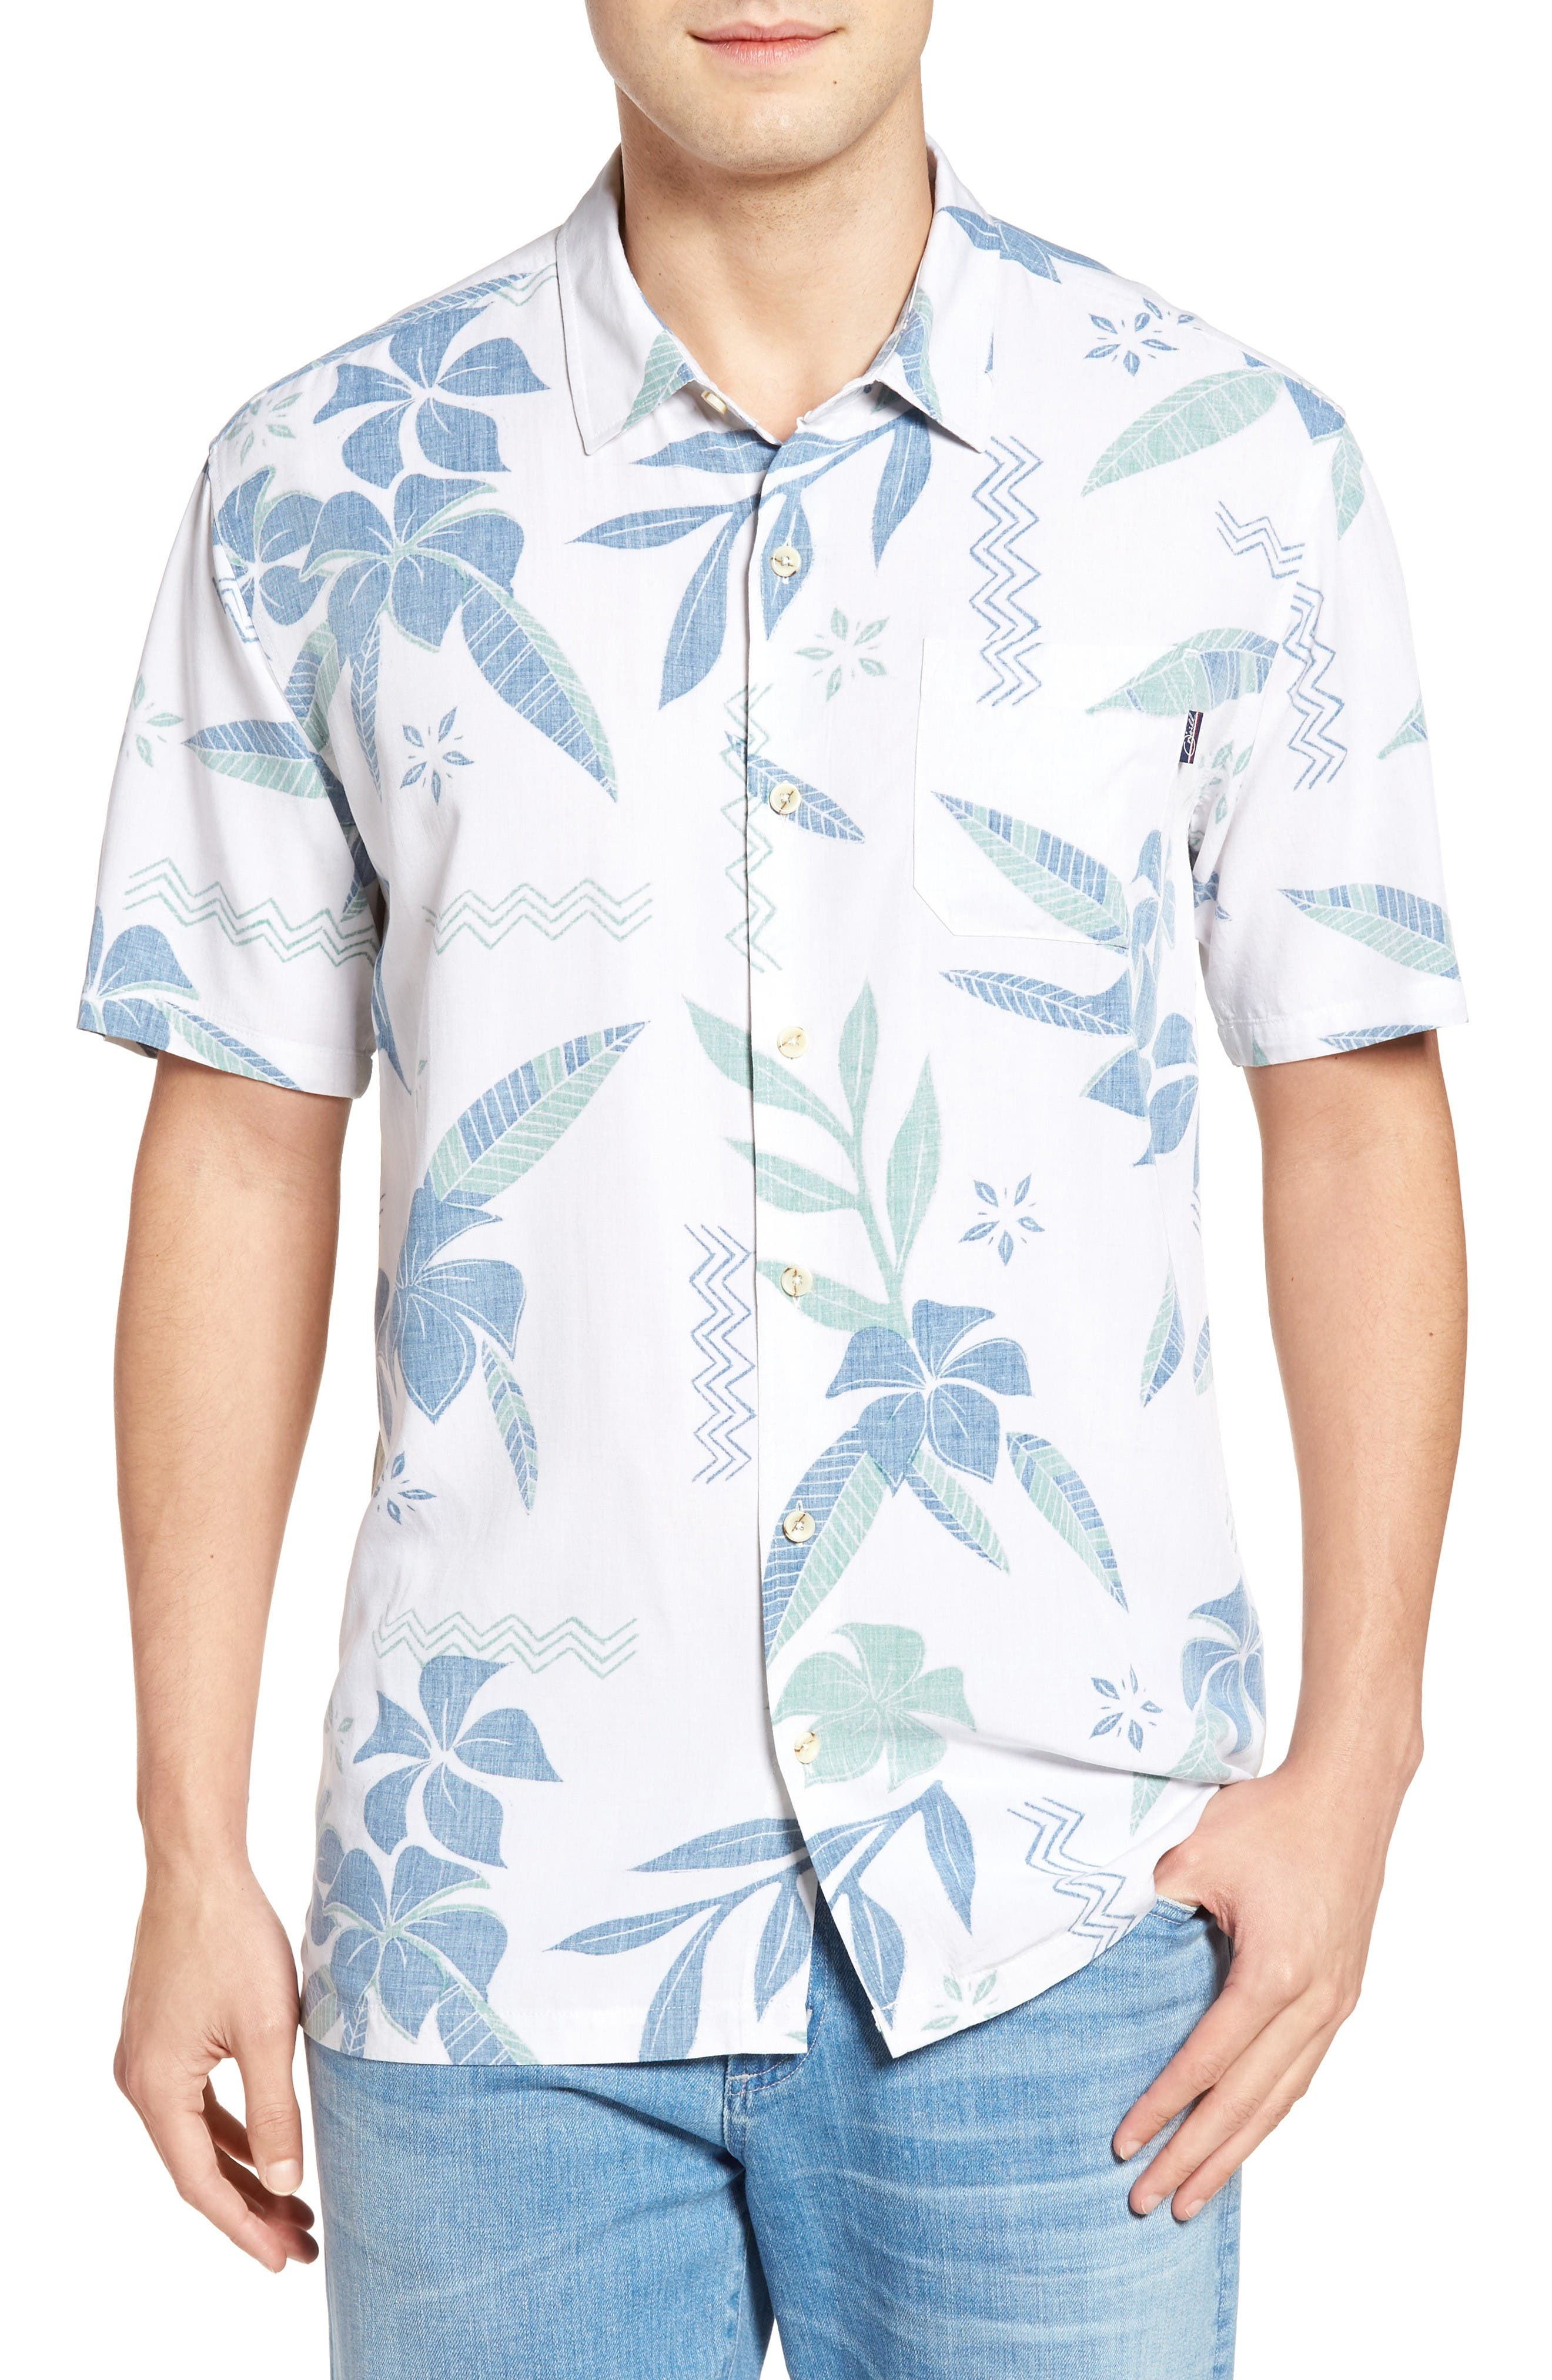 Alternate Image 1 Selected - Jack O'Neill Miramar Woven Shirt